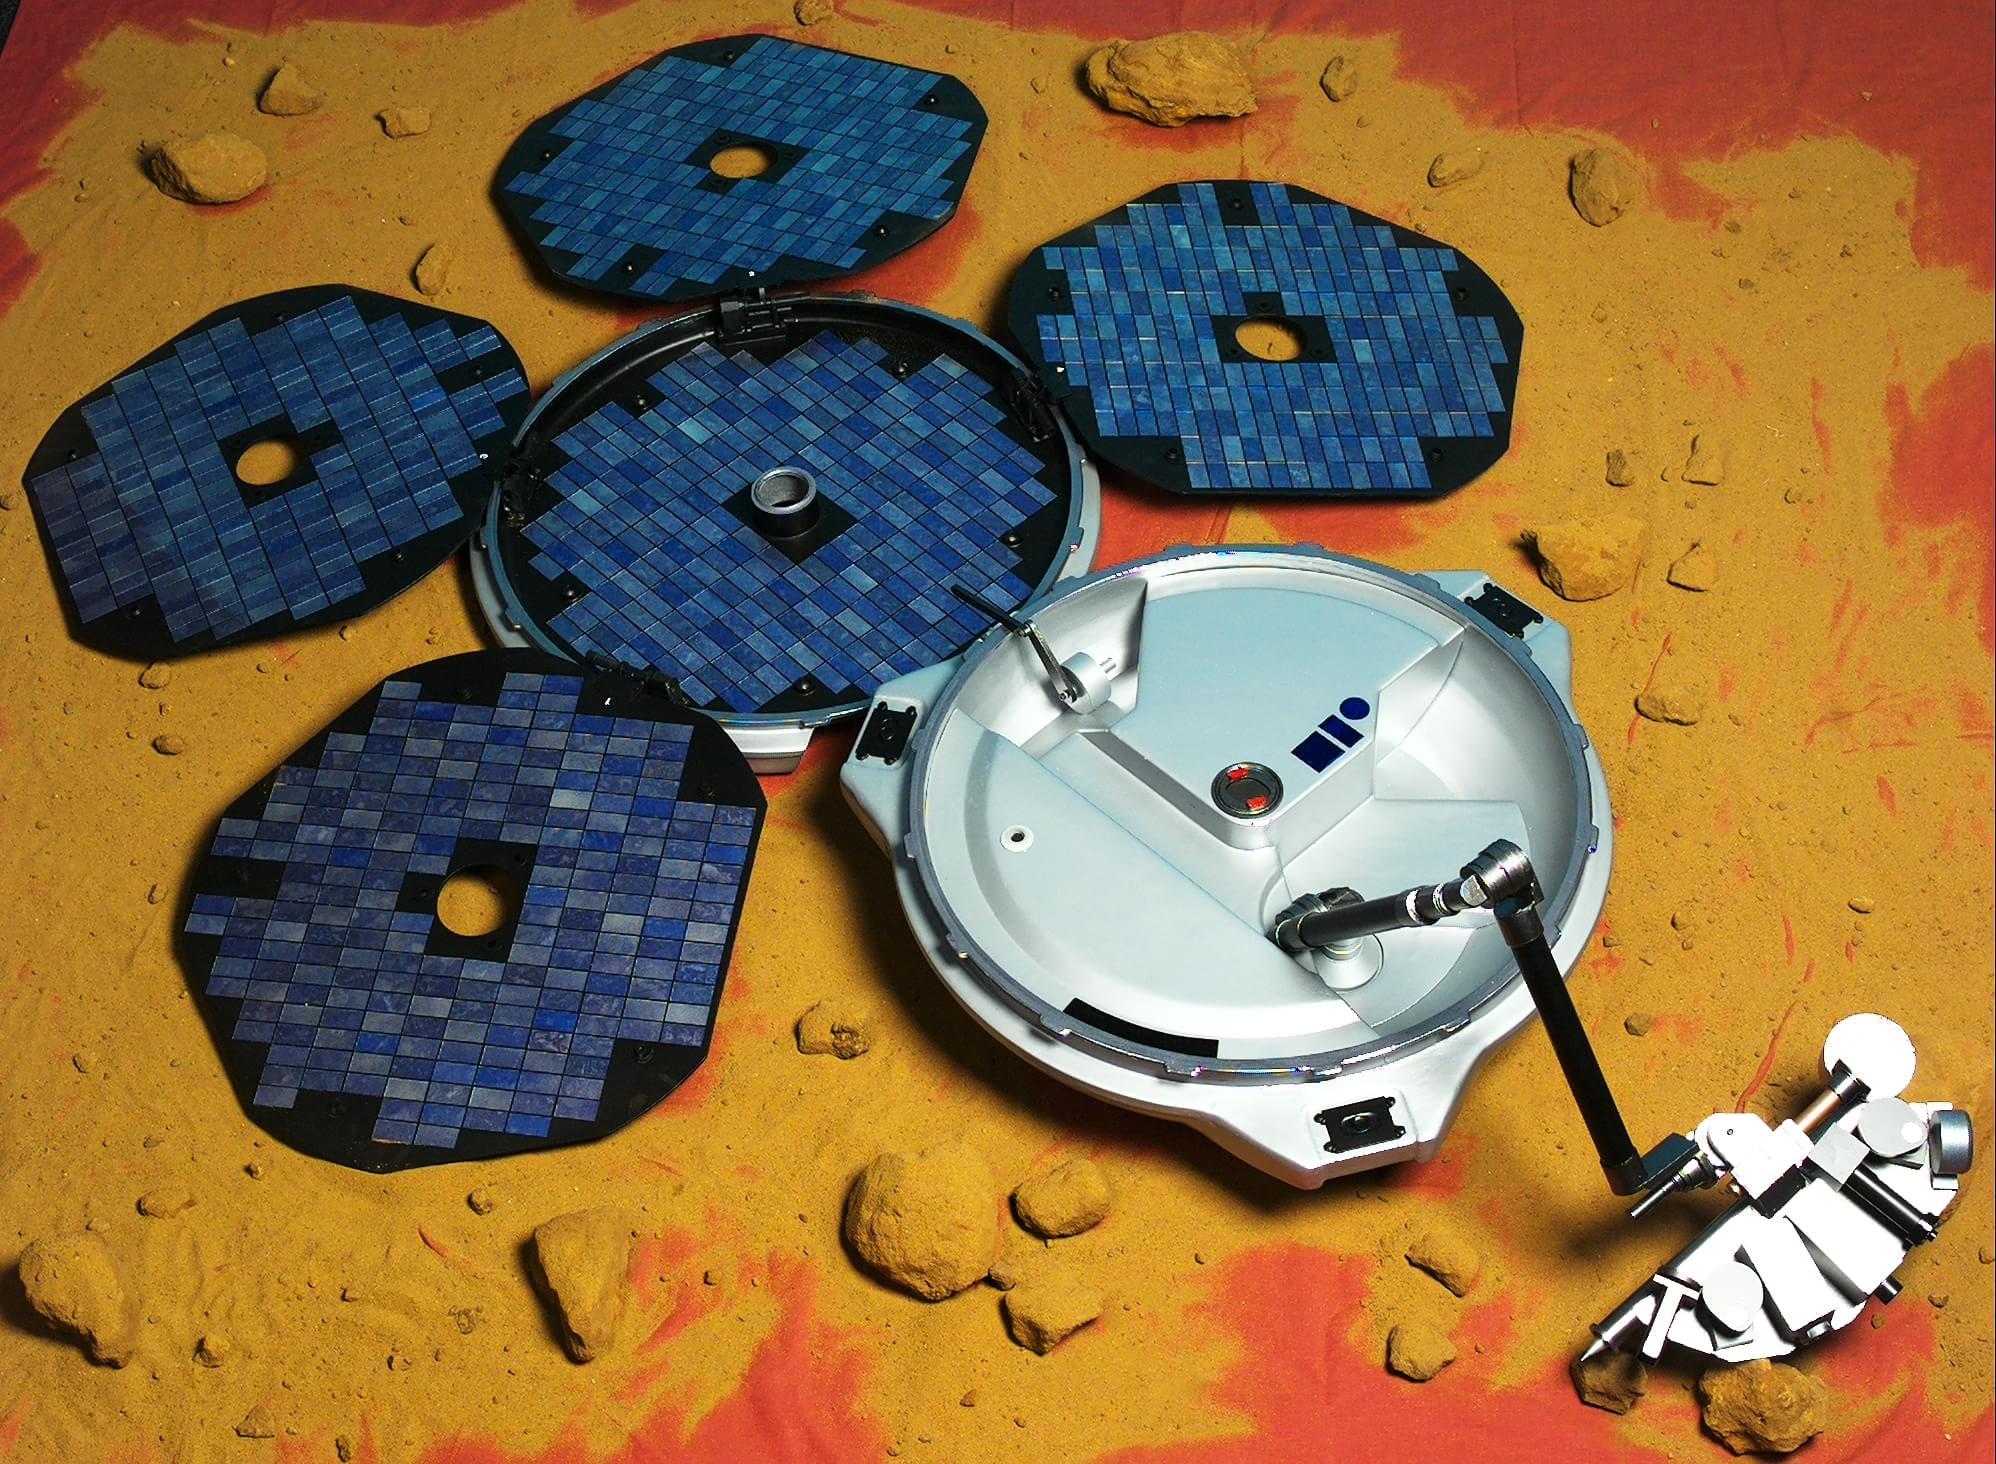 Sonda Beagle 2 é encontrada intacta no solo de Marte [vídeo]